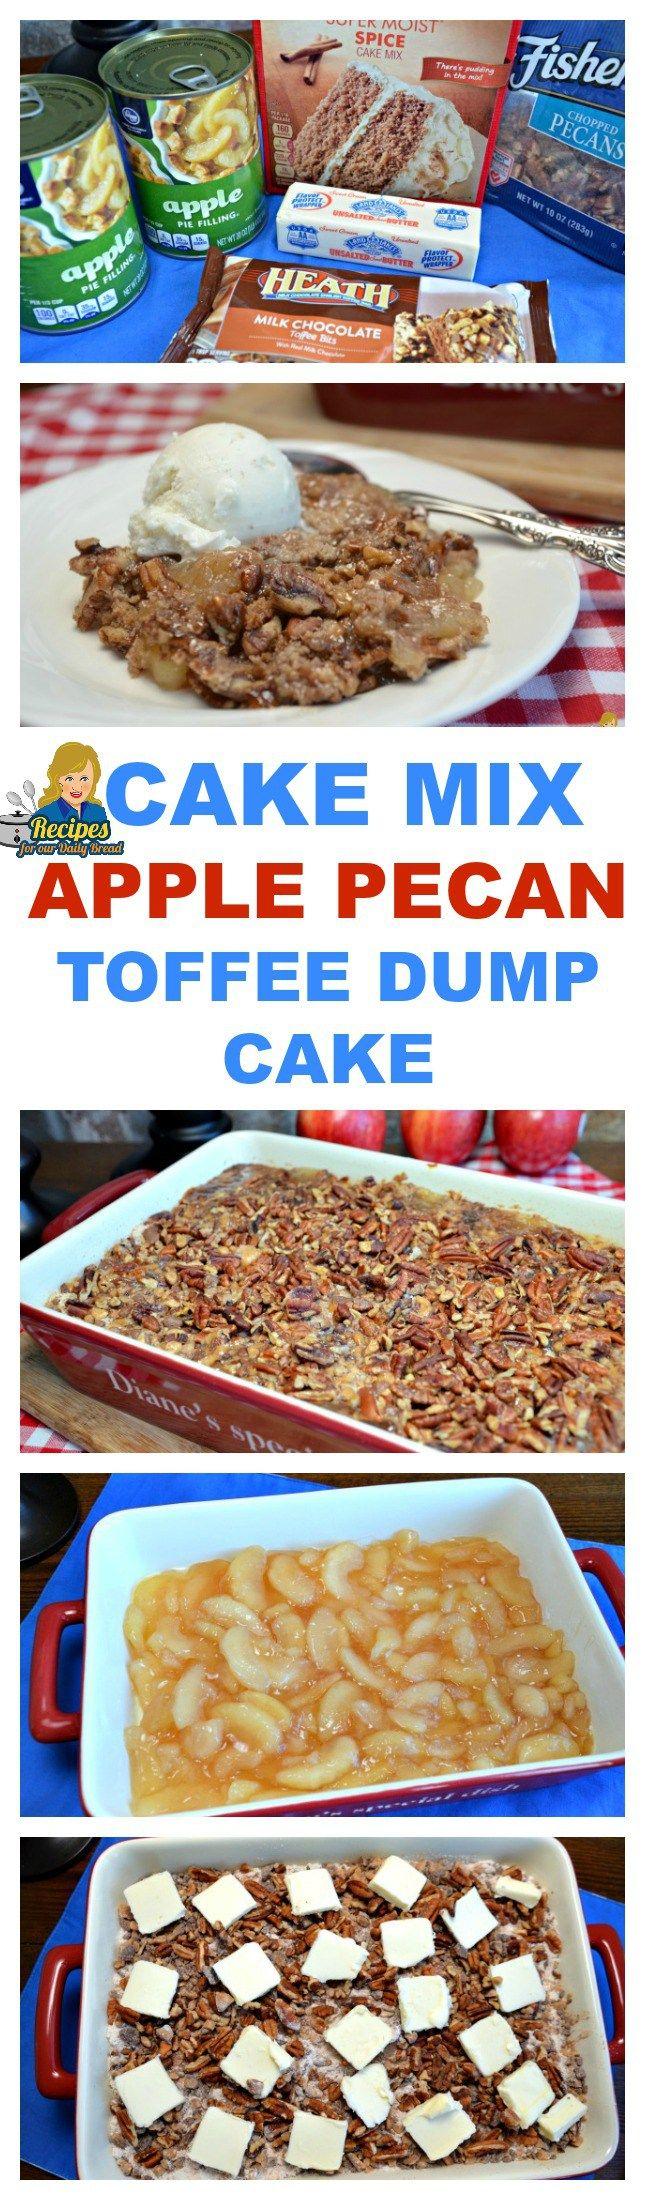 EASY CAKE MIX APPLE PECAN TOFFEE DUMP CAKE